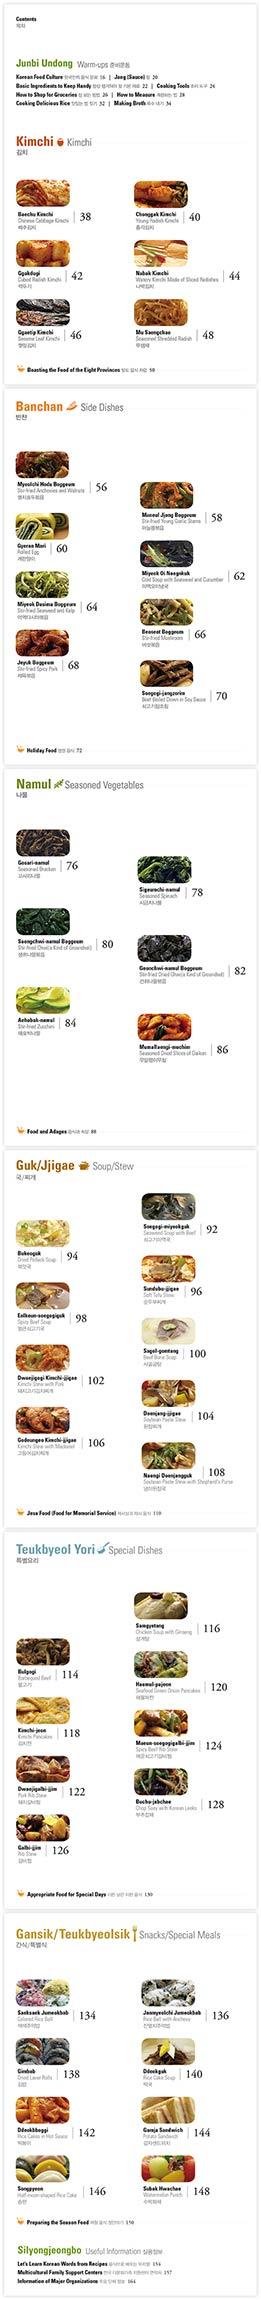 Libro-ricette-cucina-coreana-vendita-online-Dosoguan-Libreria-Coreana